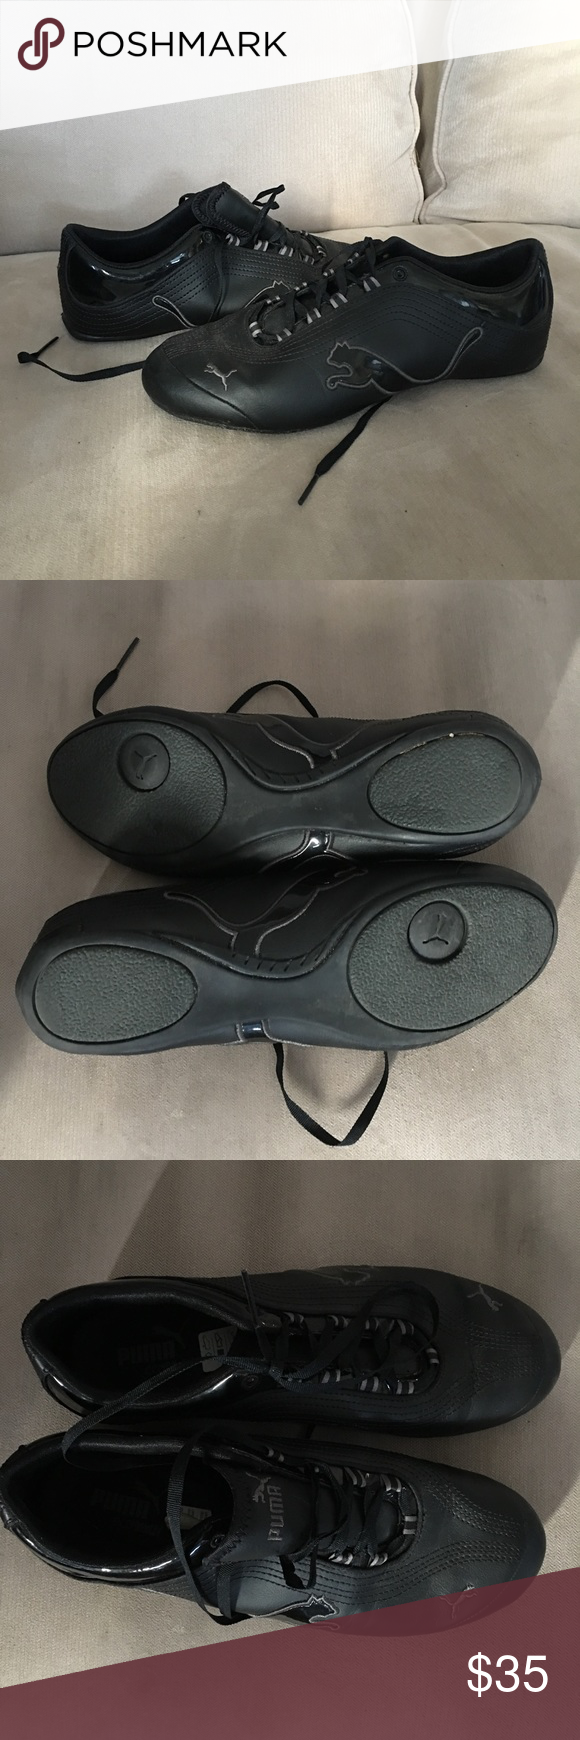 f3db1e6101e060 Puma Eco OrthoLite black shoes Black Puma shoes. Worn once. Puma Shoes  Athletic Shoes